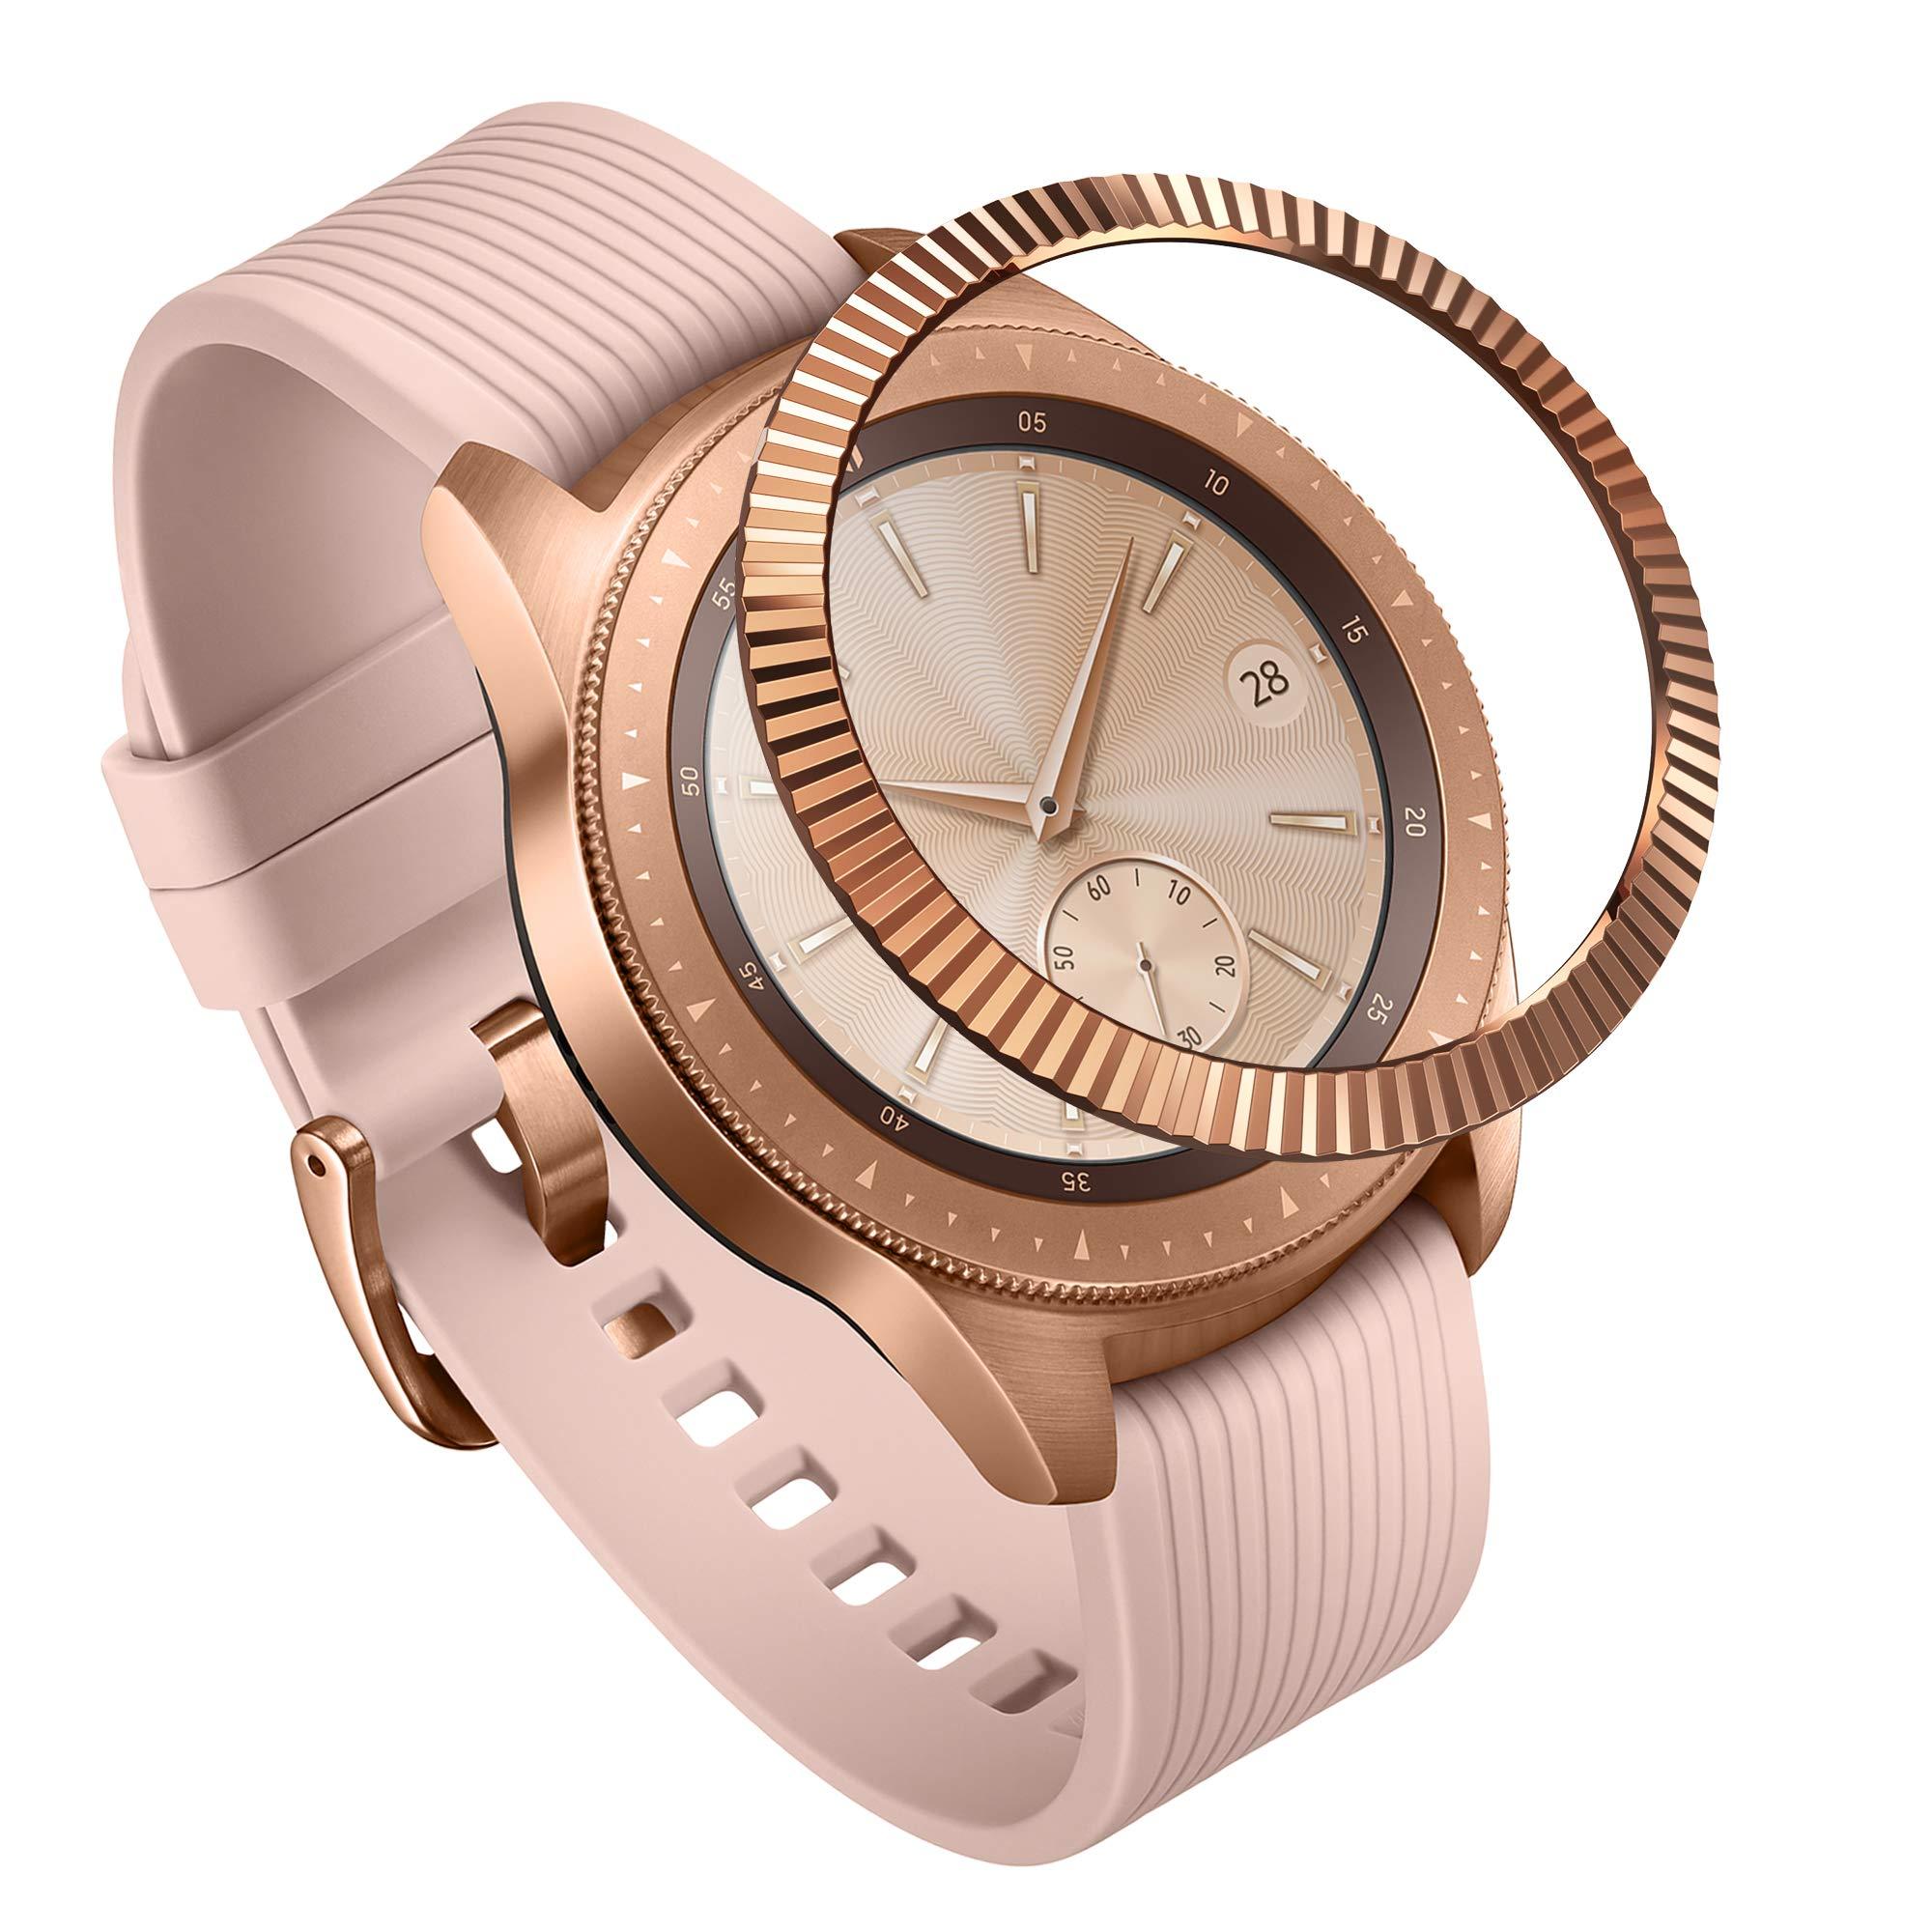 Ringke Bezel Styling for Galaxy Watch 42mm / Gear Sport Bezel Ring Adhesive Cover Anti Scratch Stainless Steel Protection [Stainless] for Galaxy Watch Accessory GW-42-06 by Ringke